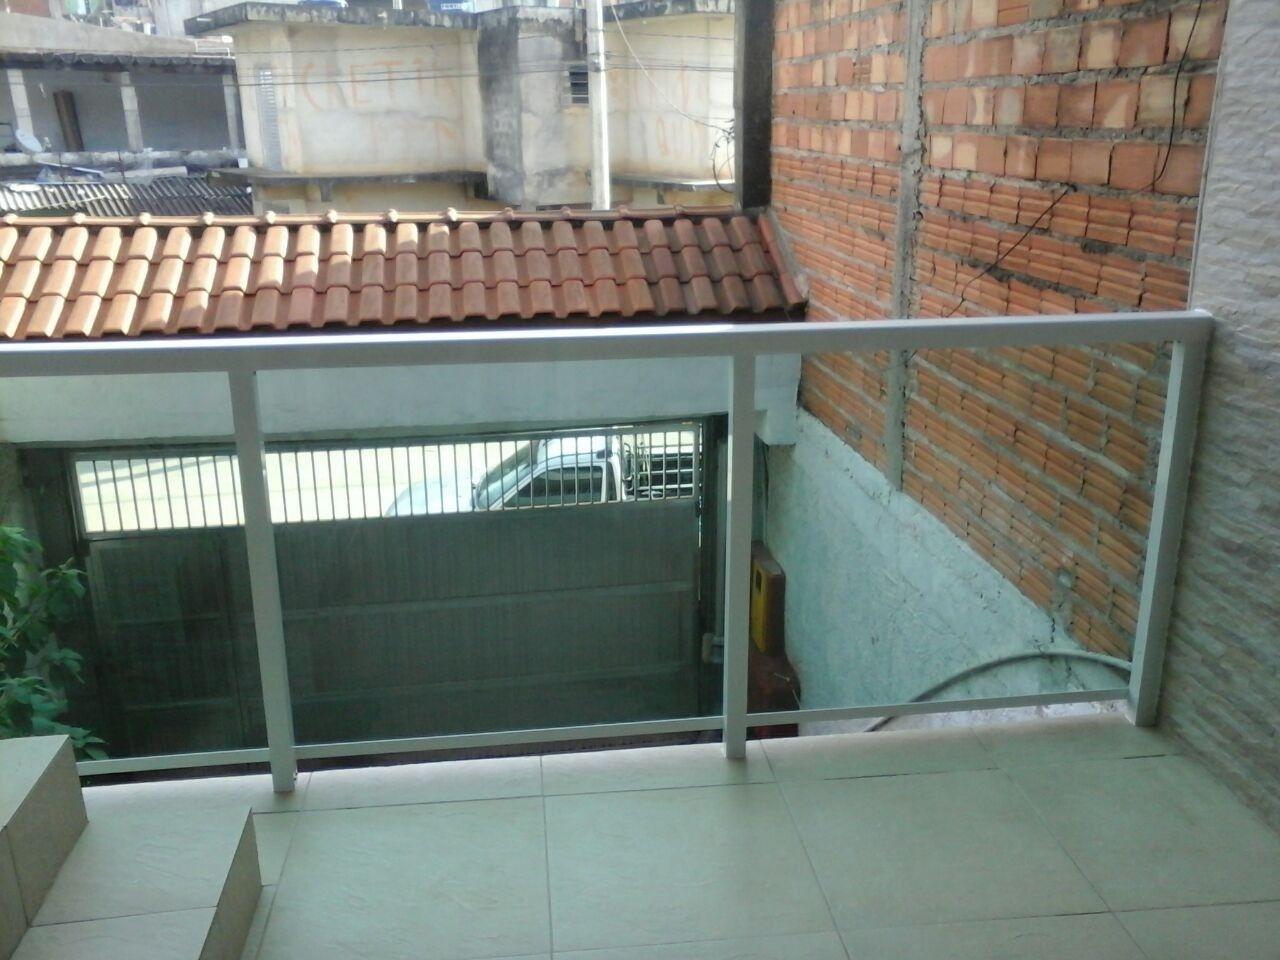 Loja Guarda Corpo na Vila Prudente - Guarda Corpo em São Paulo